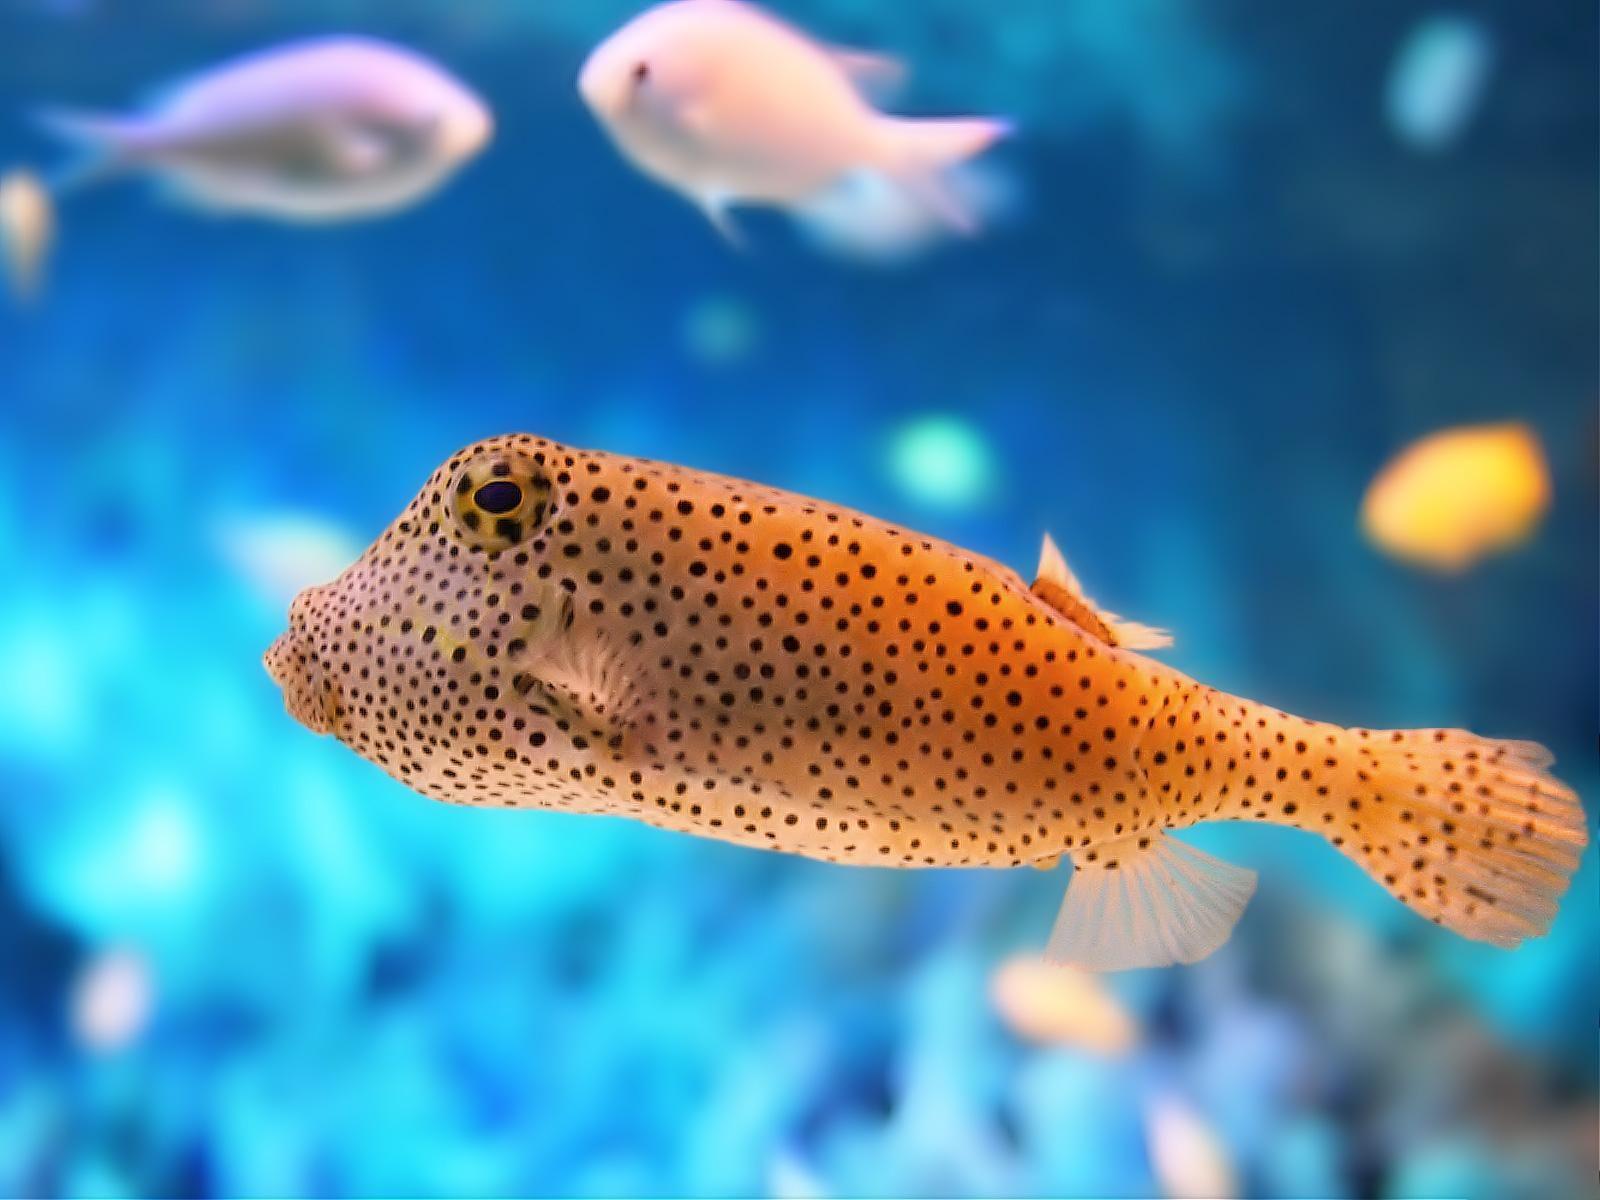 Fish aquarium in jeddah - Fish Animal Download Fish Wallpapers Wallpaper Sea Fish Wallpaper